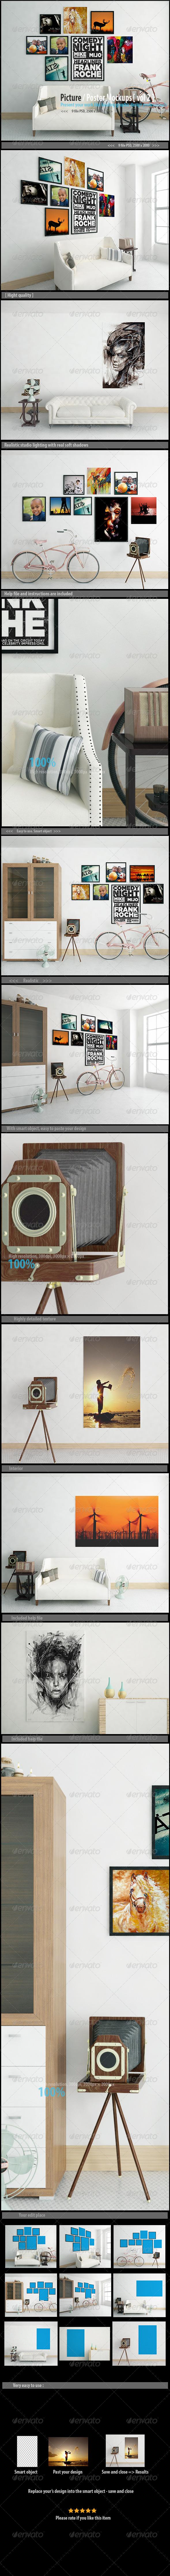 GraphicRiver Picture Poster Mockups [vol 2] 7720356